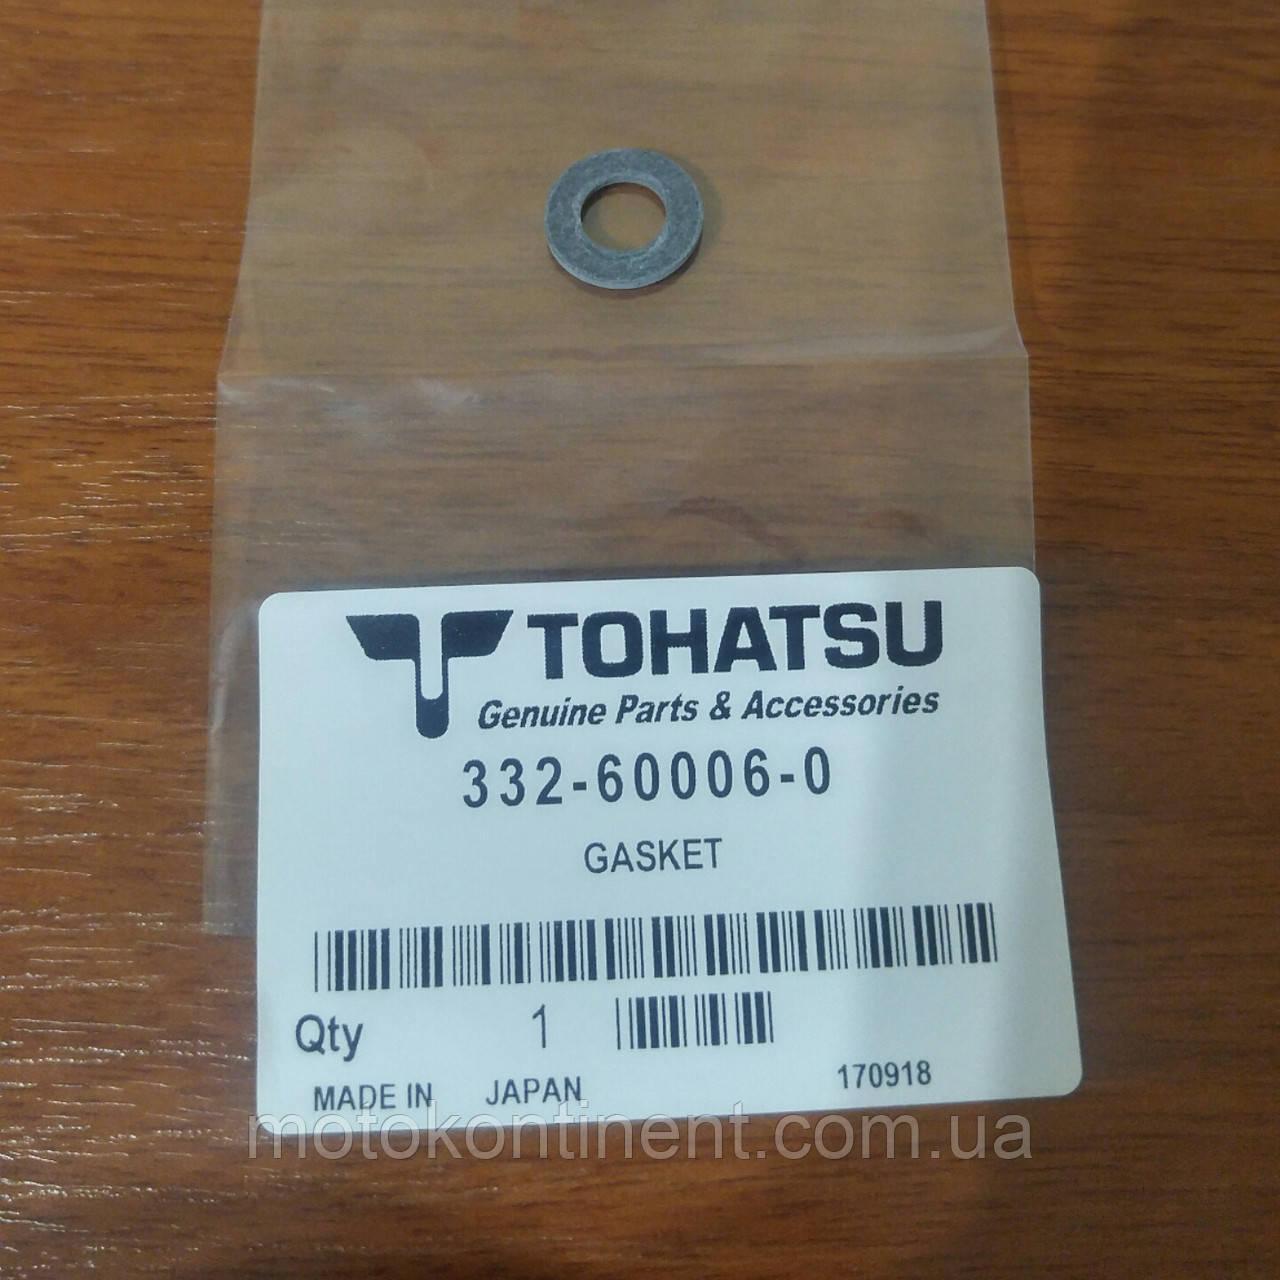 332-60006-0 Прокладка сливной/ заливной пробки редуктора Tohatsu